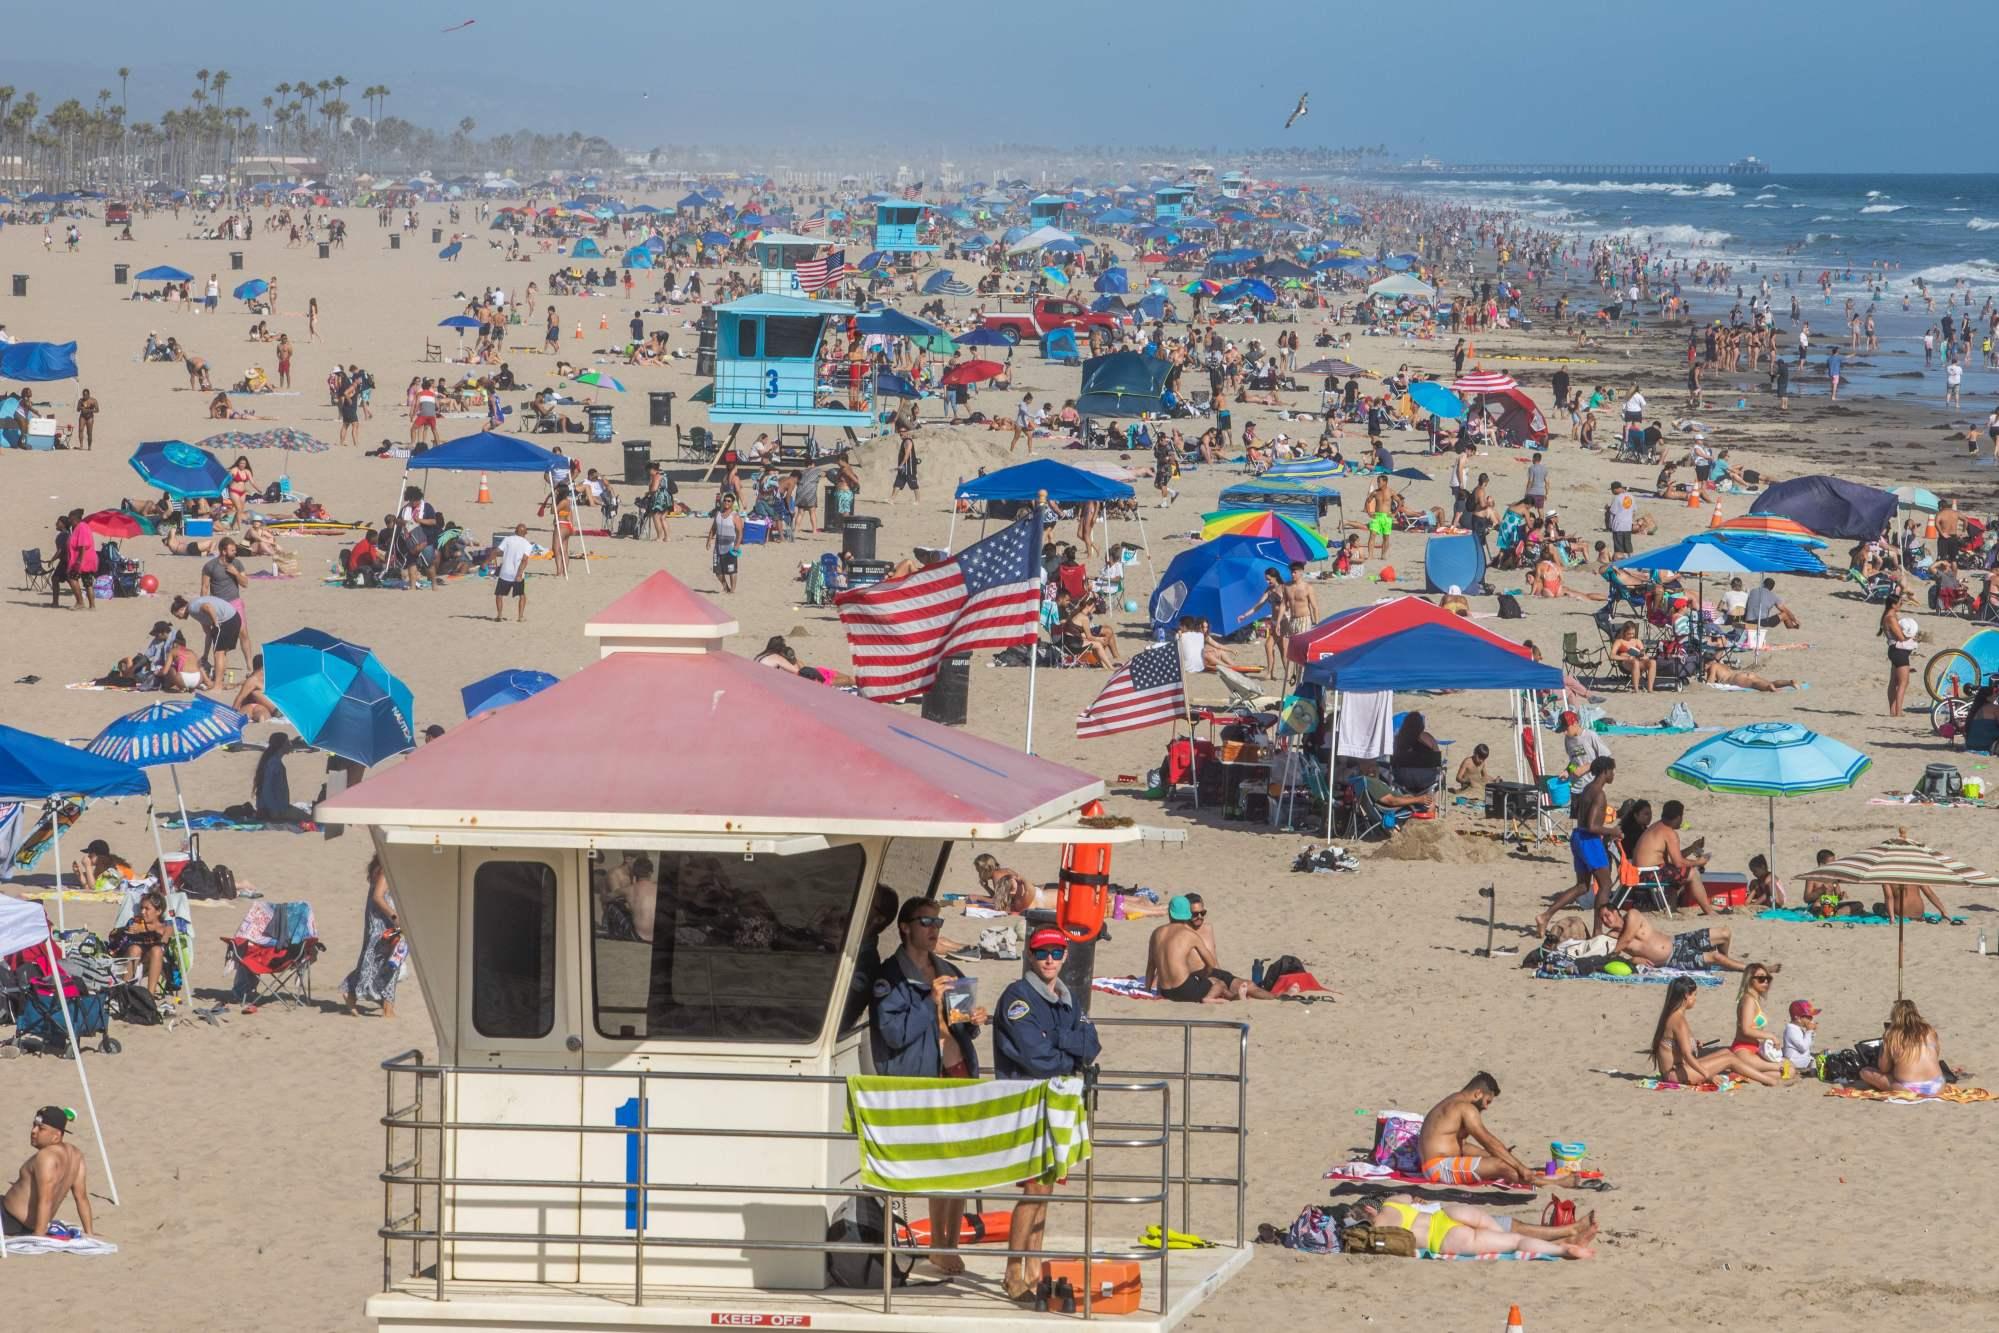 People enjoy the beach amid the coronavirus pandemic in Huntington Beach, on June 14, 2020. (Apu GOMES / AFP) (Photo by APU GOMES/AFP via Getty Images)